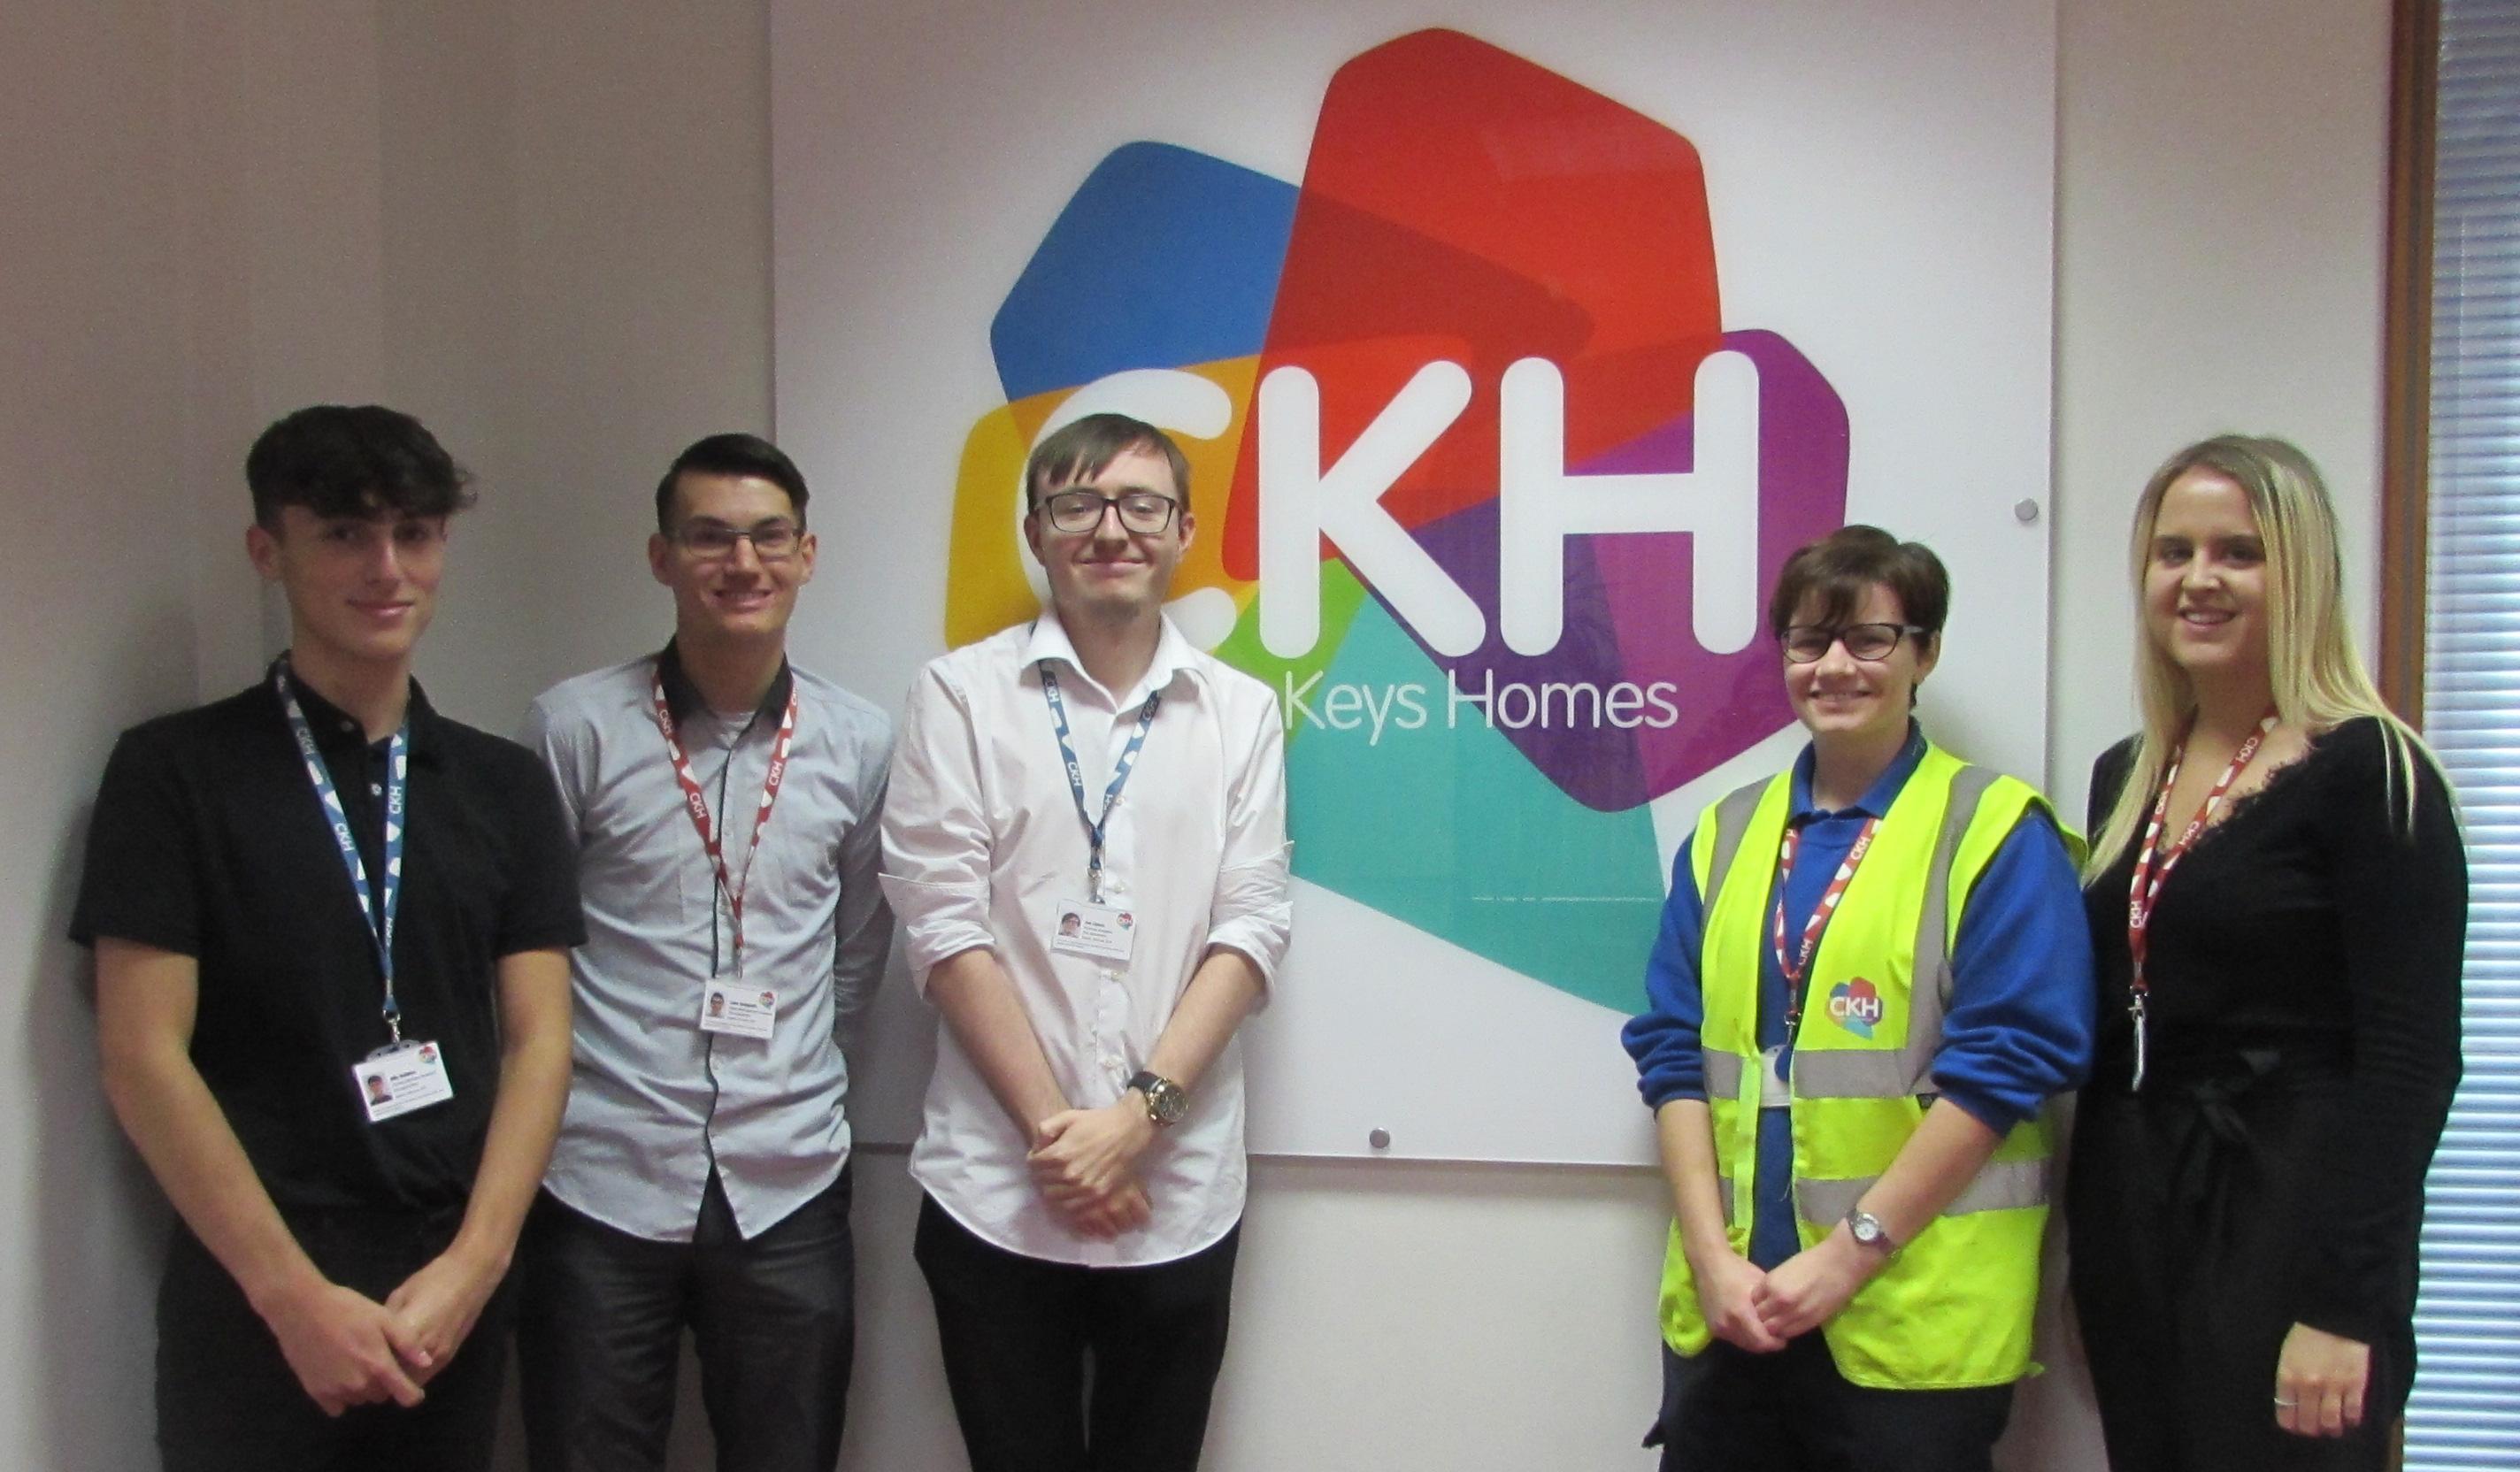 Cross Keys Homes' pre-apprentices reach half way point